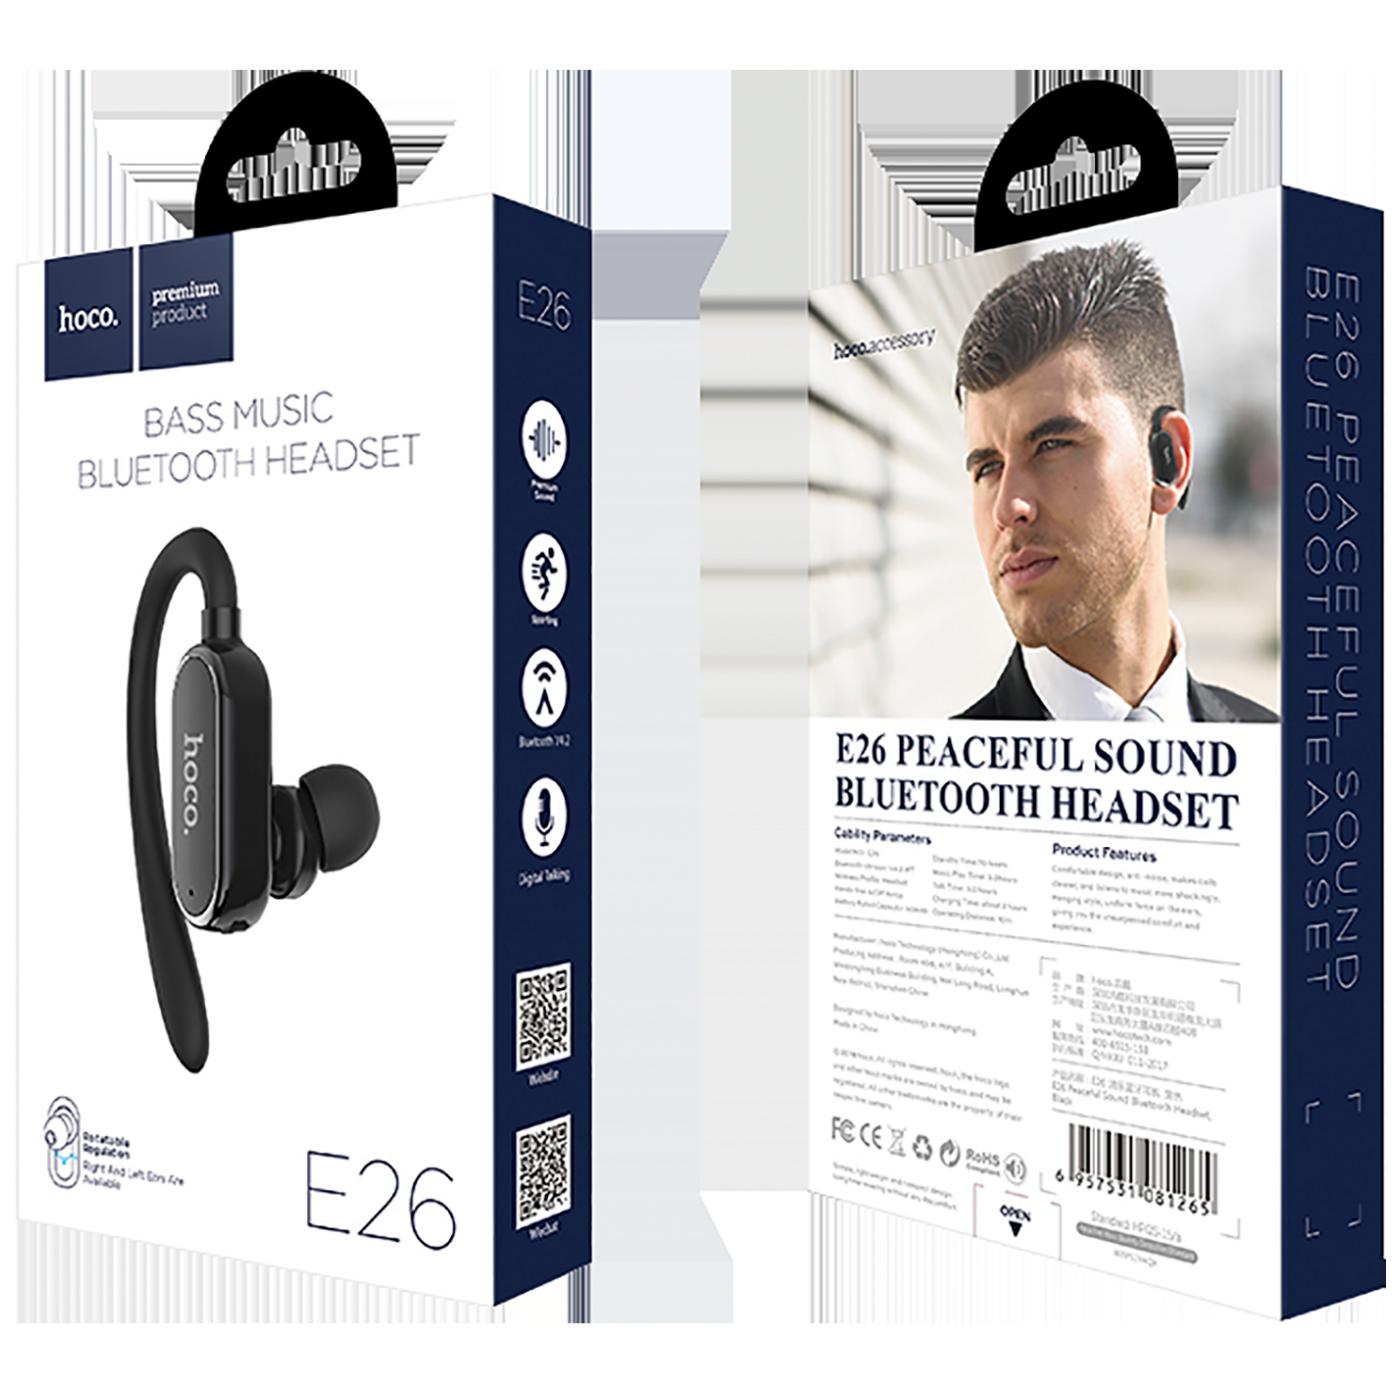 E26 Peaceful BT headset